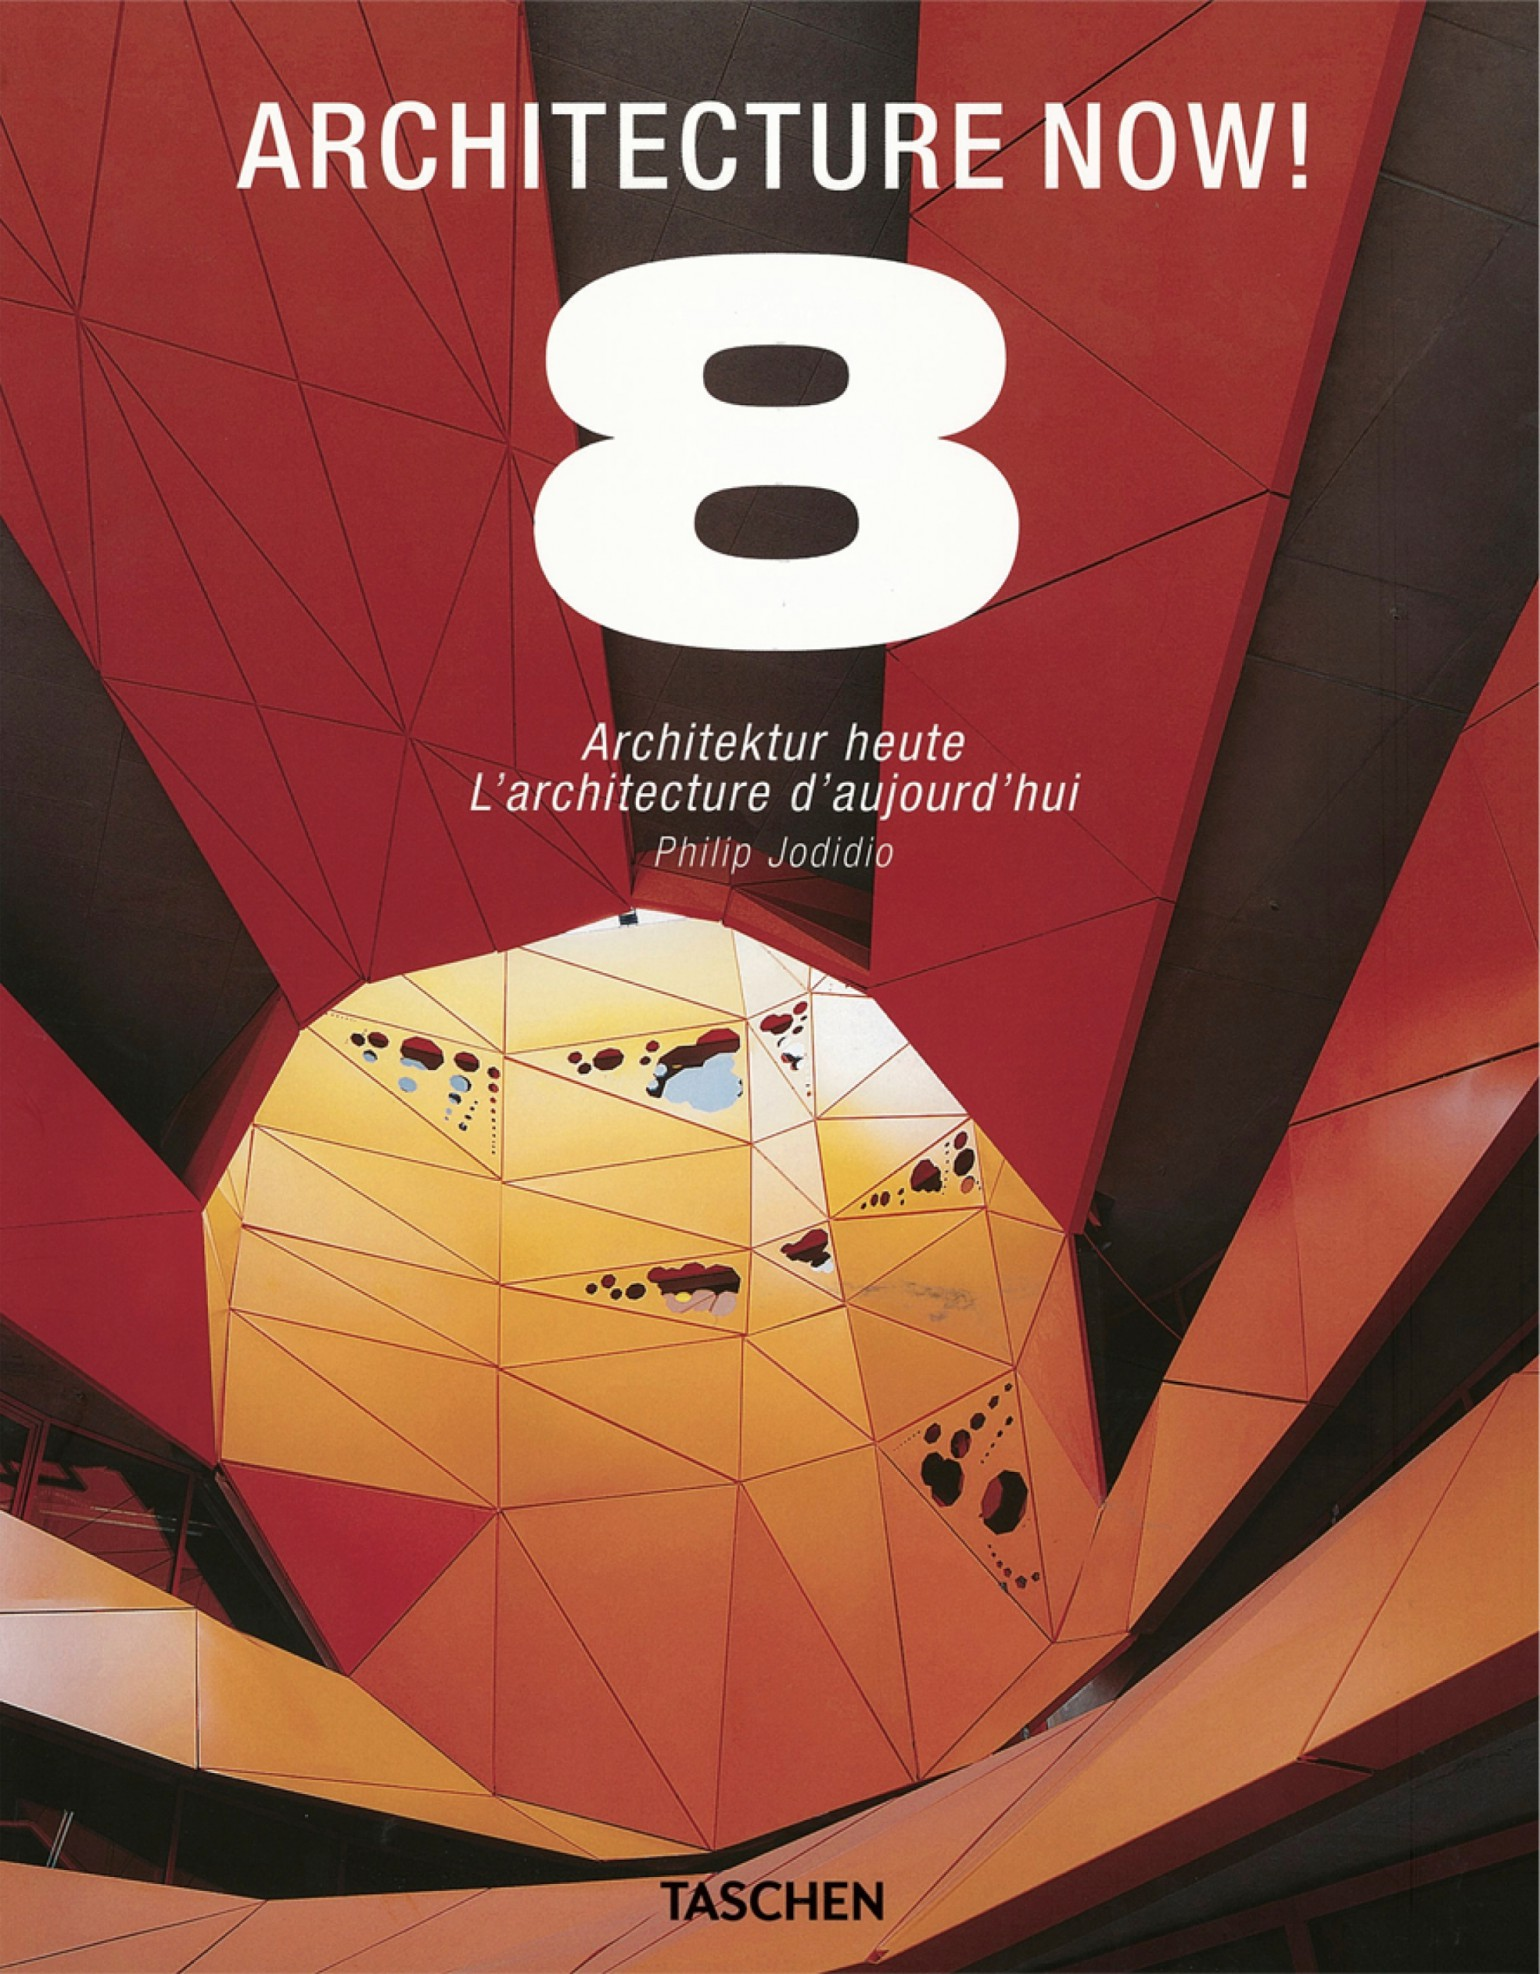 2012 EPV Architecturenowvol8-janvier-1